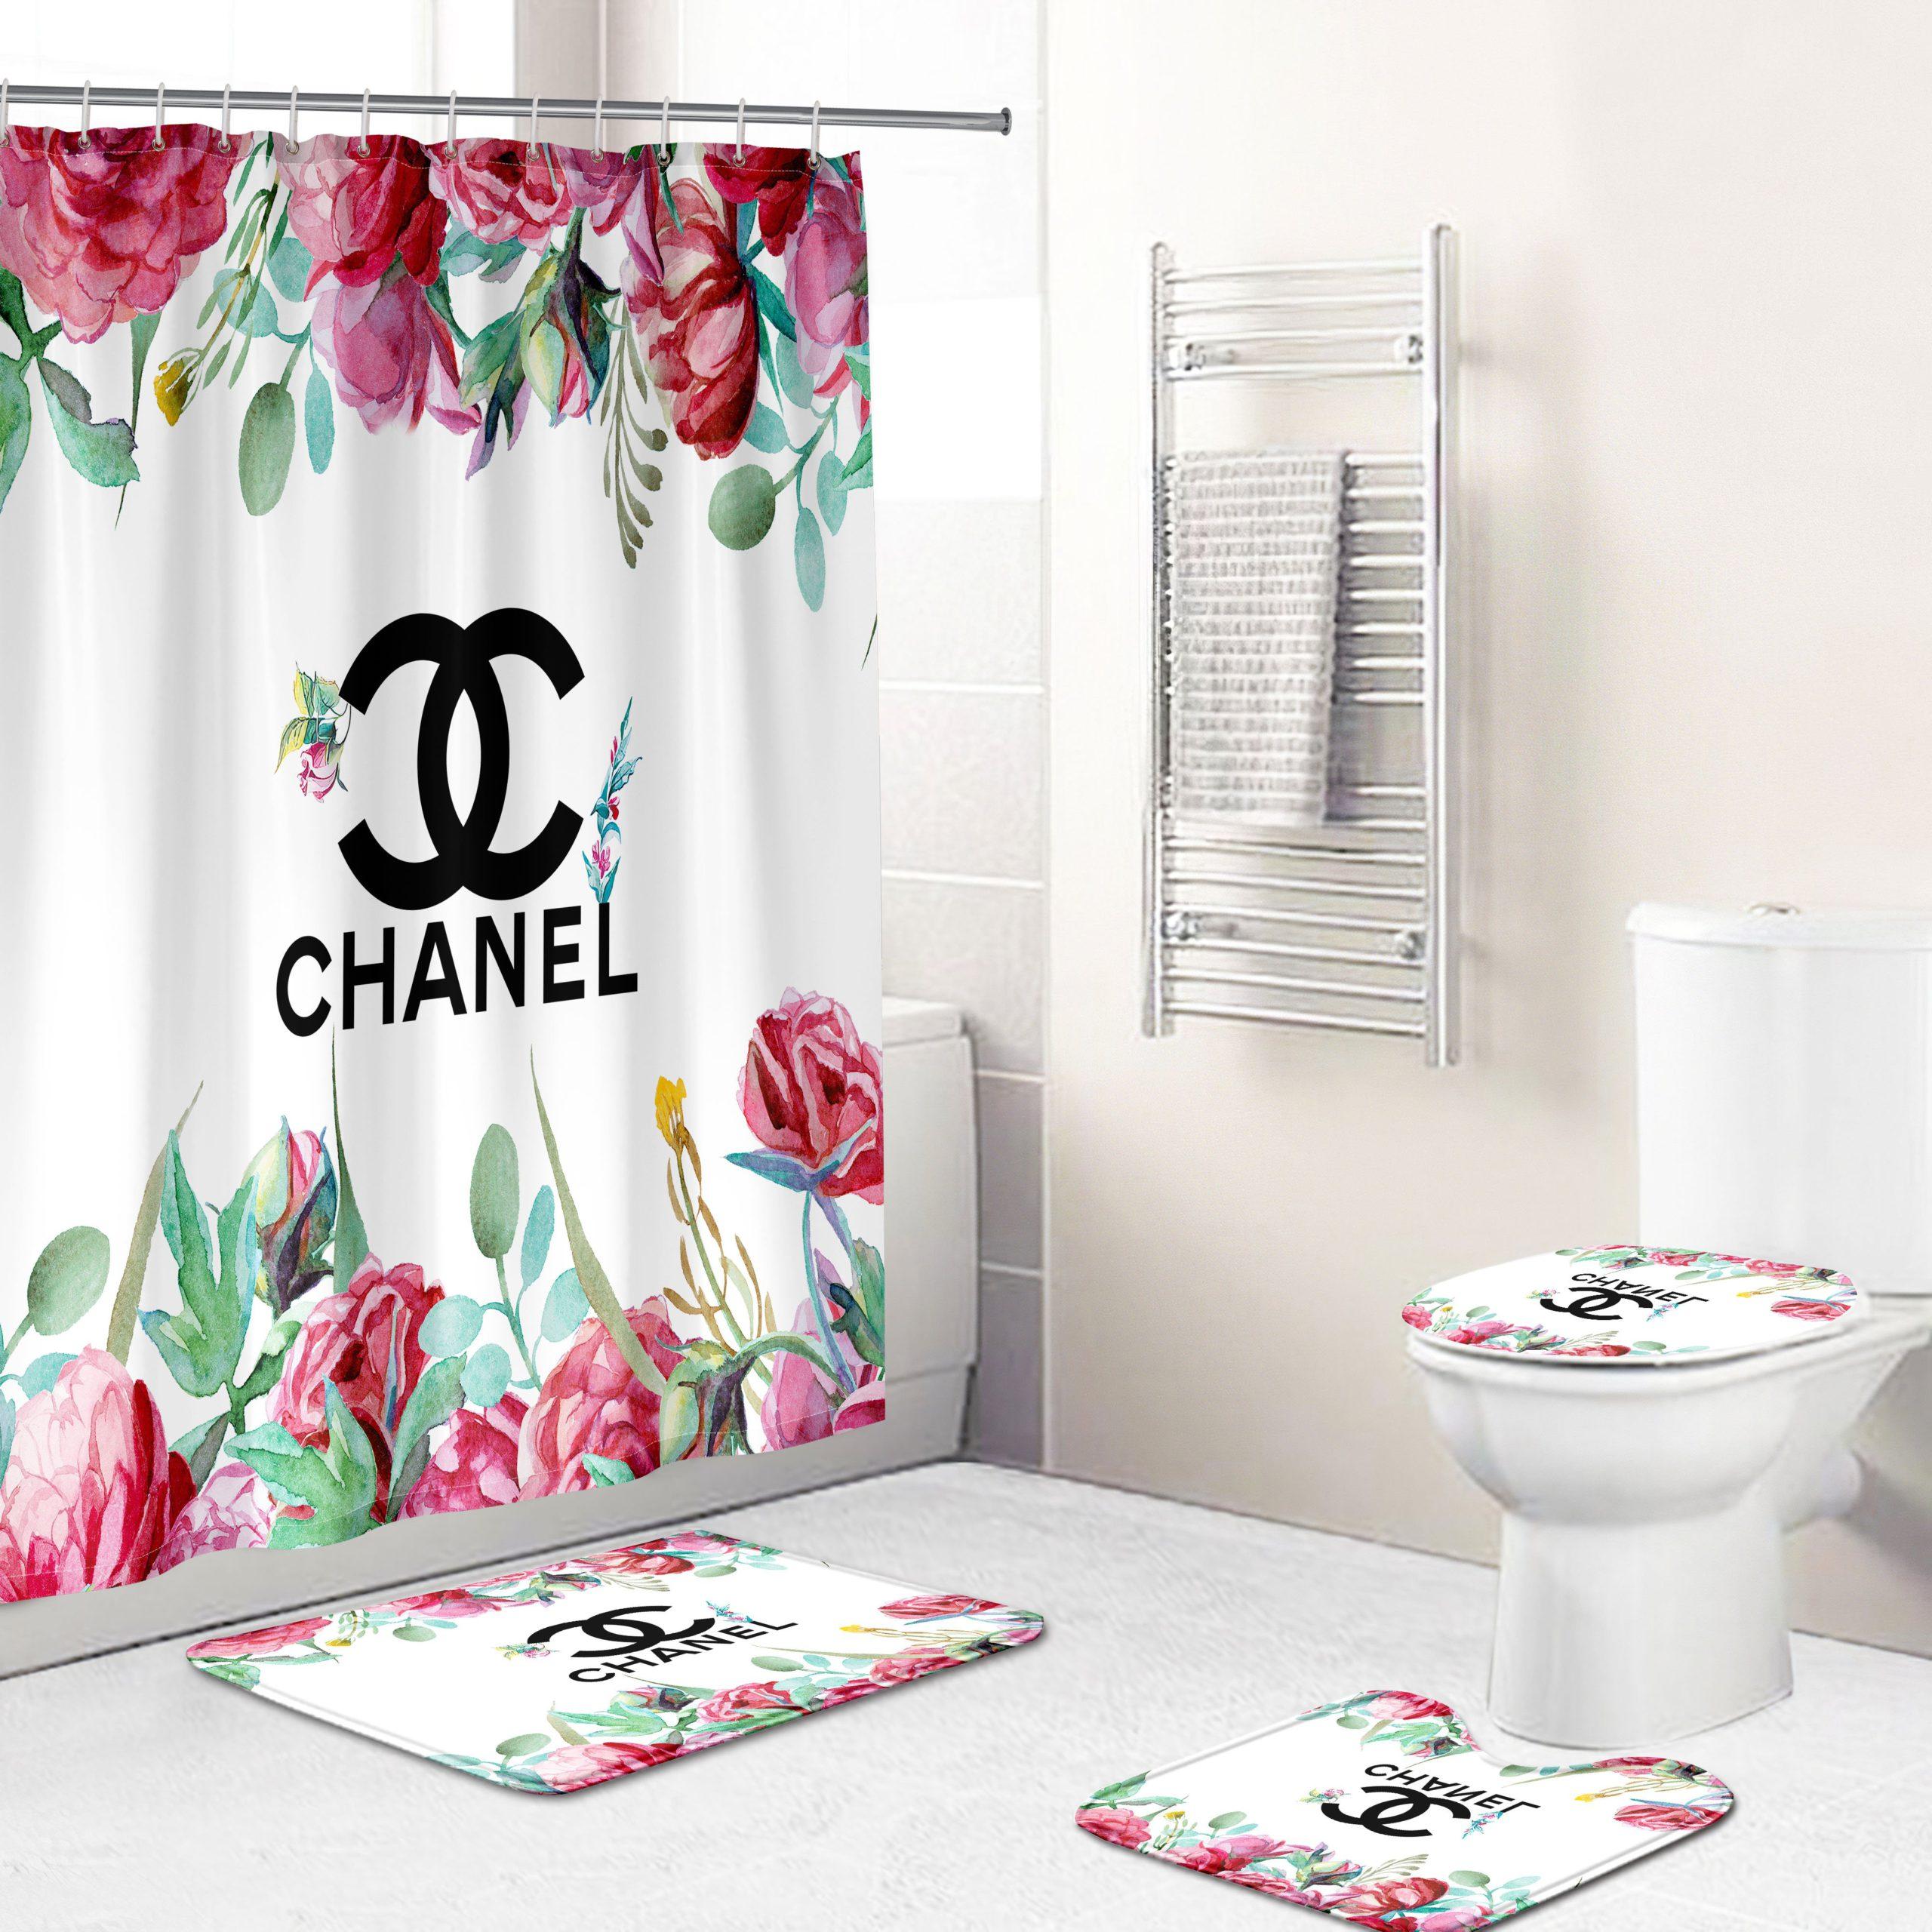 Chanel Floral Shower Curtain Luxury Brand Bathroom Set